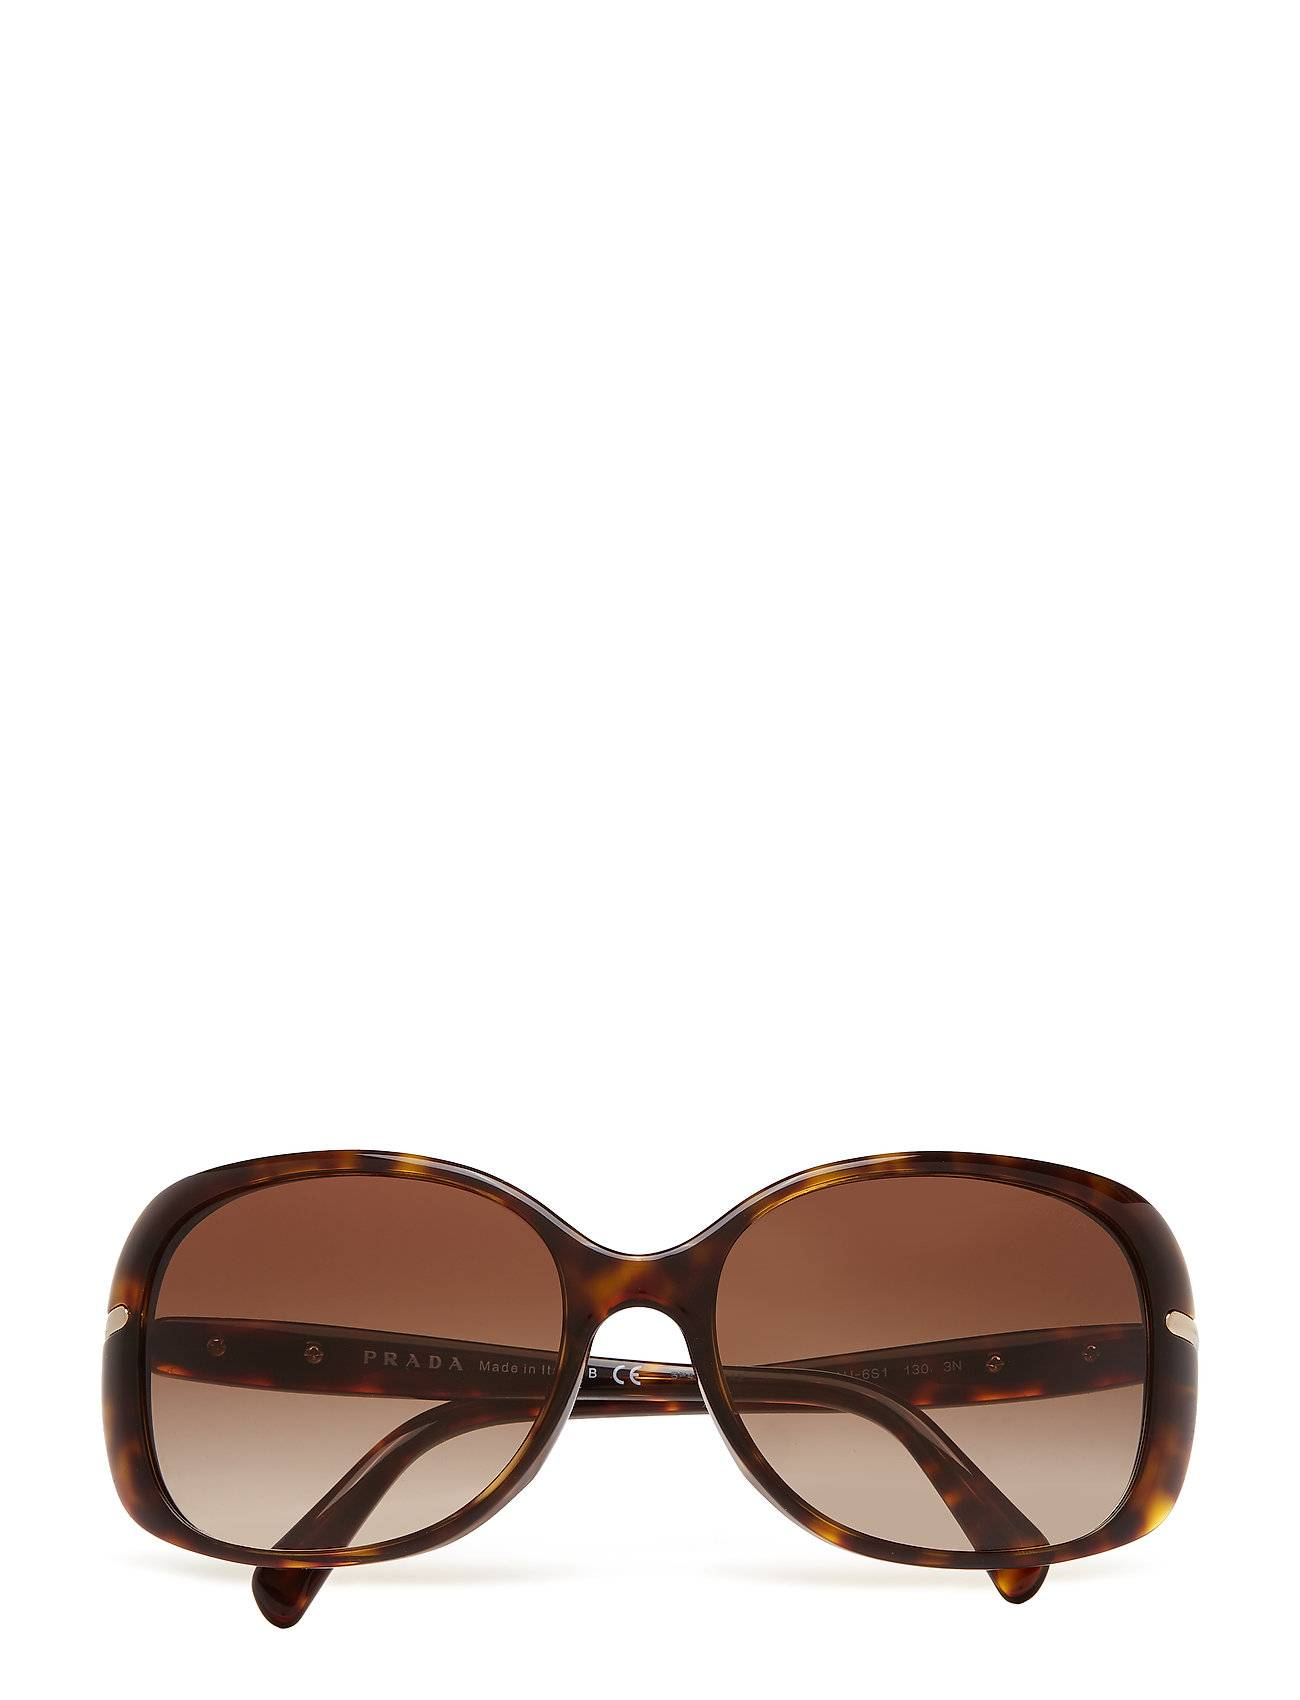 Image of Prada Sunglasses Conceptual   Arrow Wayfarer Aurinkolasit Ruskea